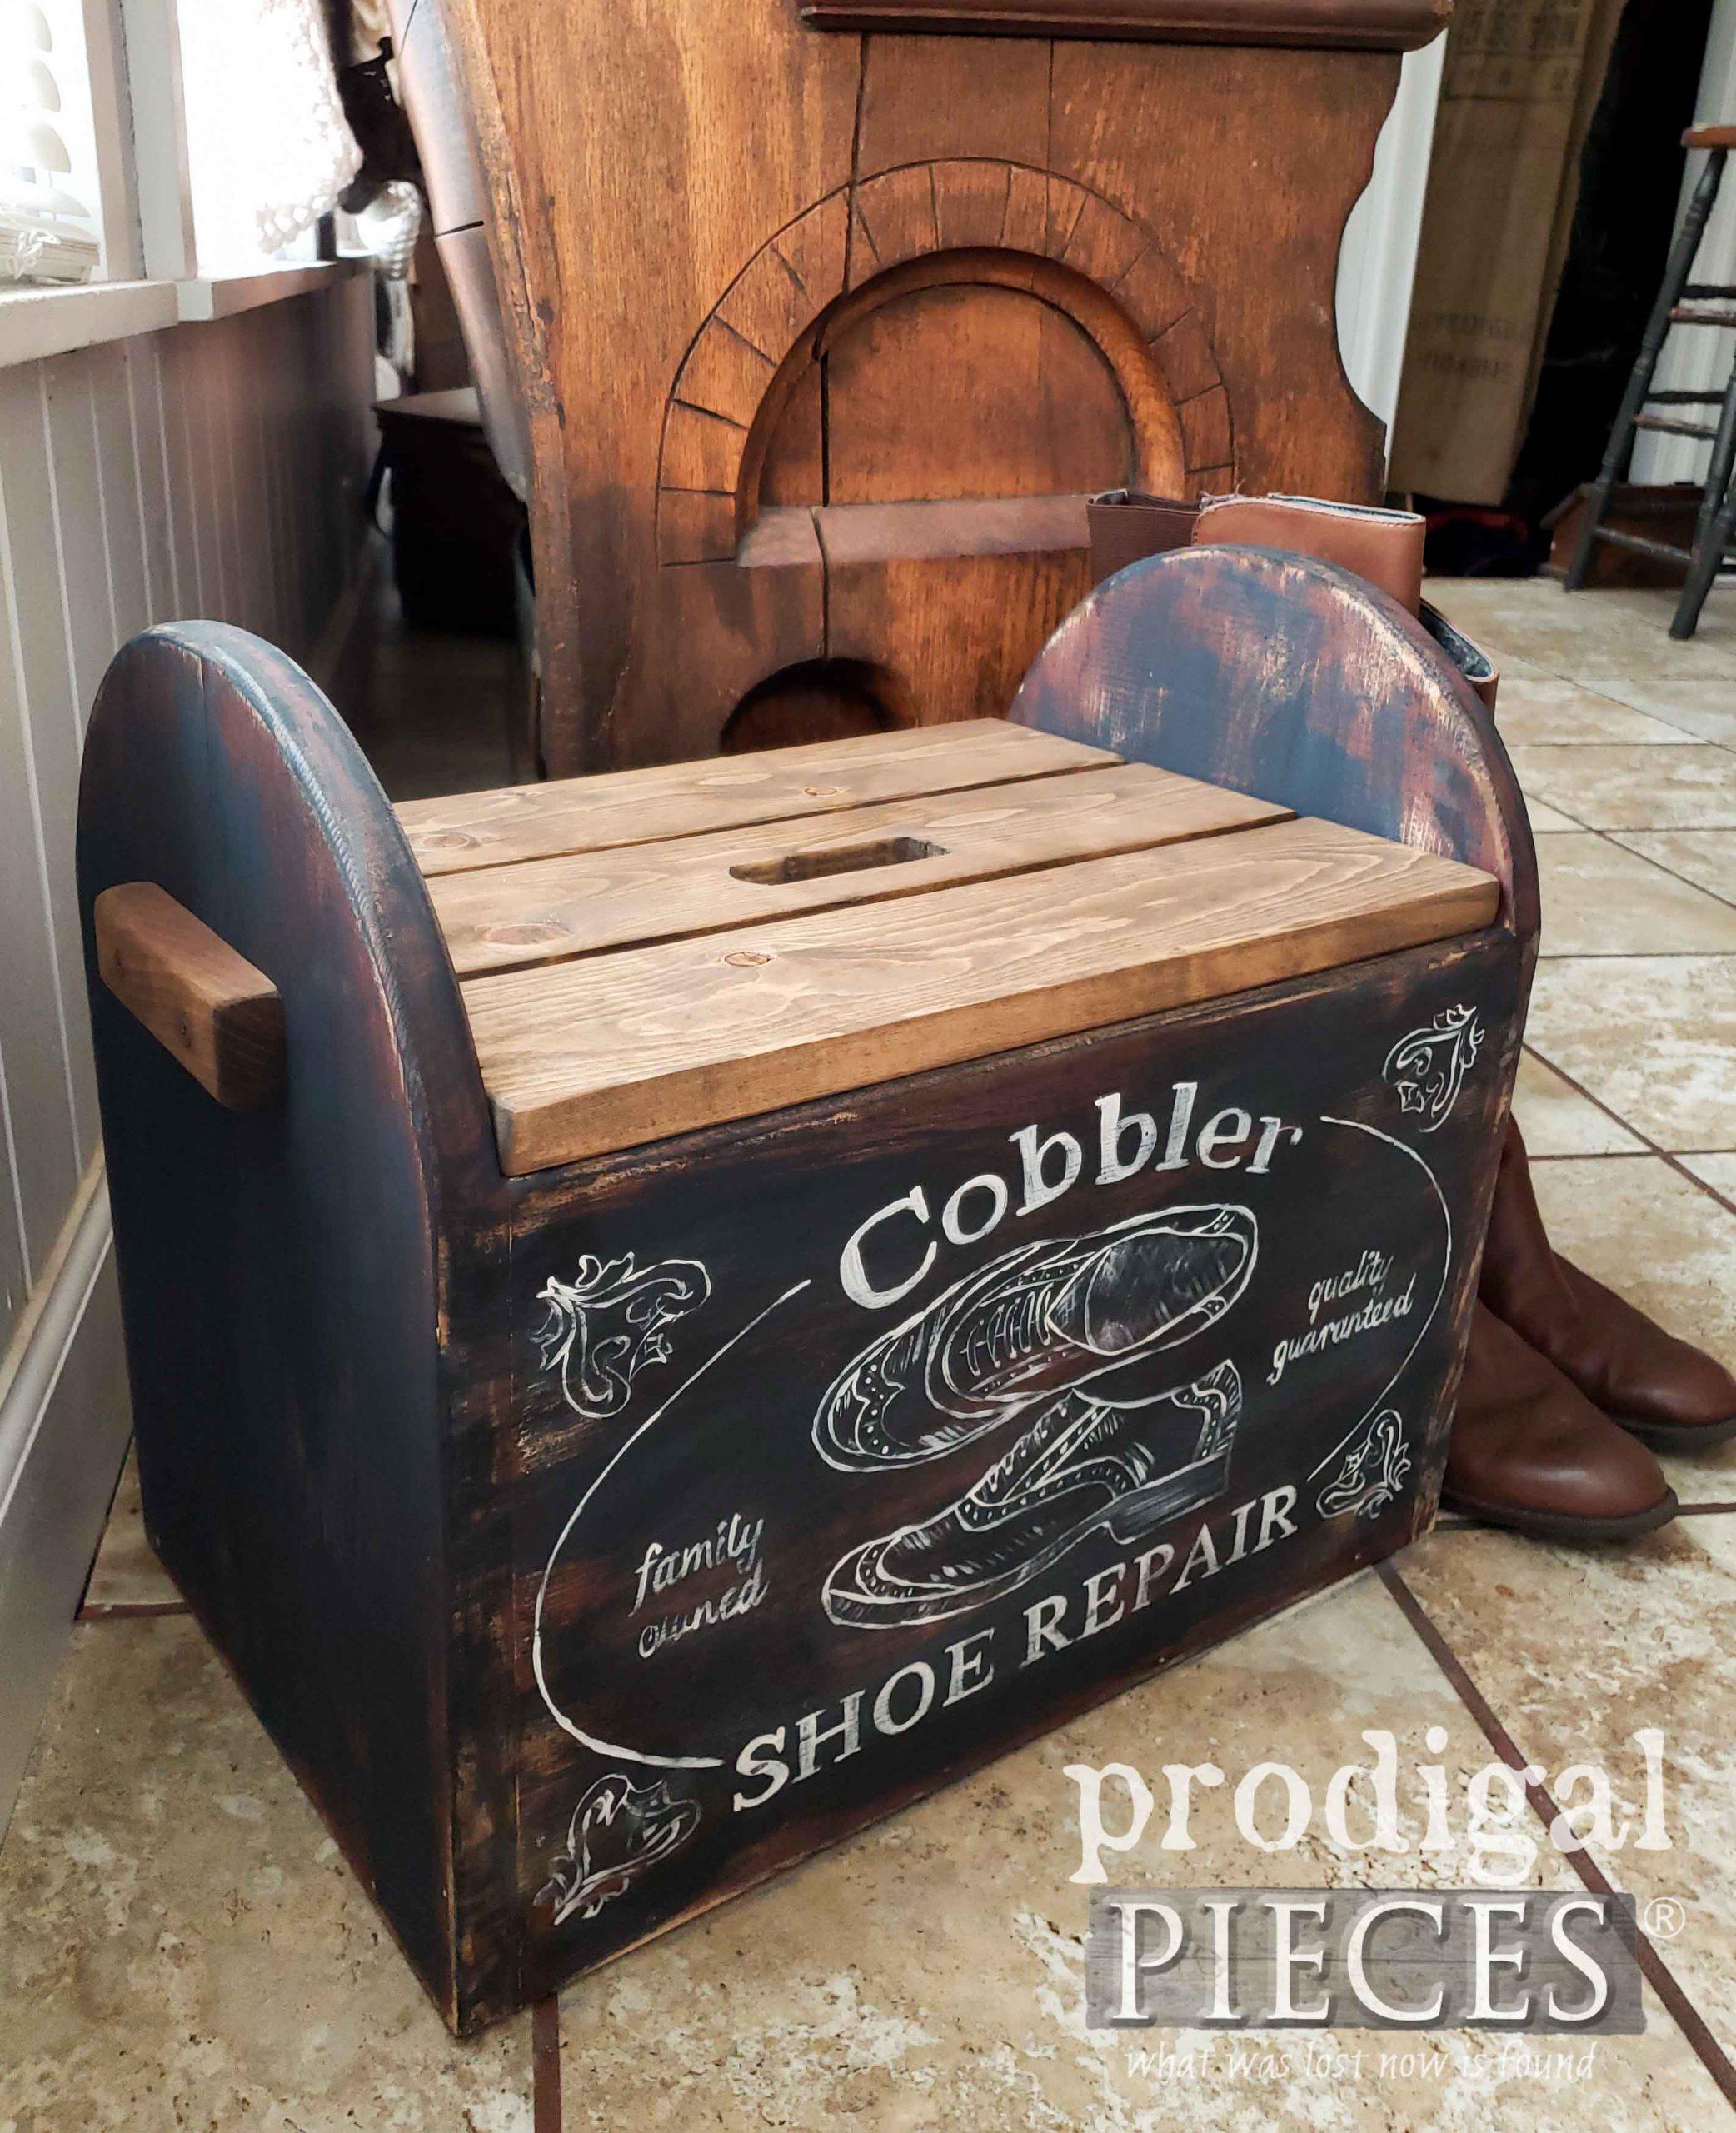 Handmade Crate Style Farmhouse Cobbler Bin Decor by Larissa of Prodigal Pieces | prodigalpieces.com #prodigalpieces #diy #farmhouse #home #rustic #homedecor